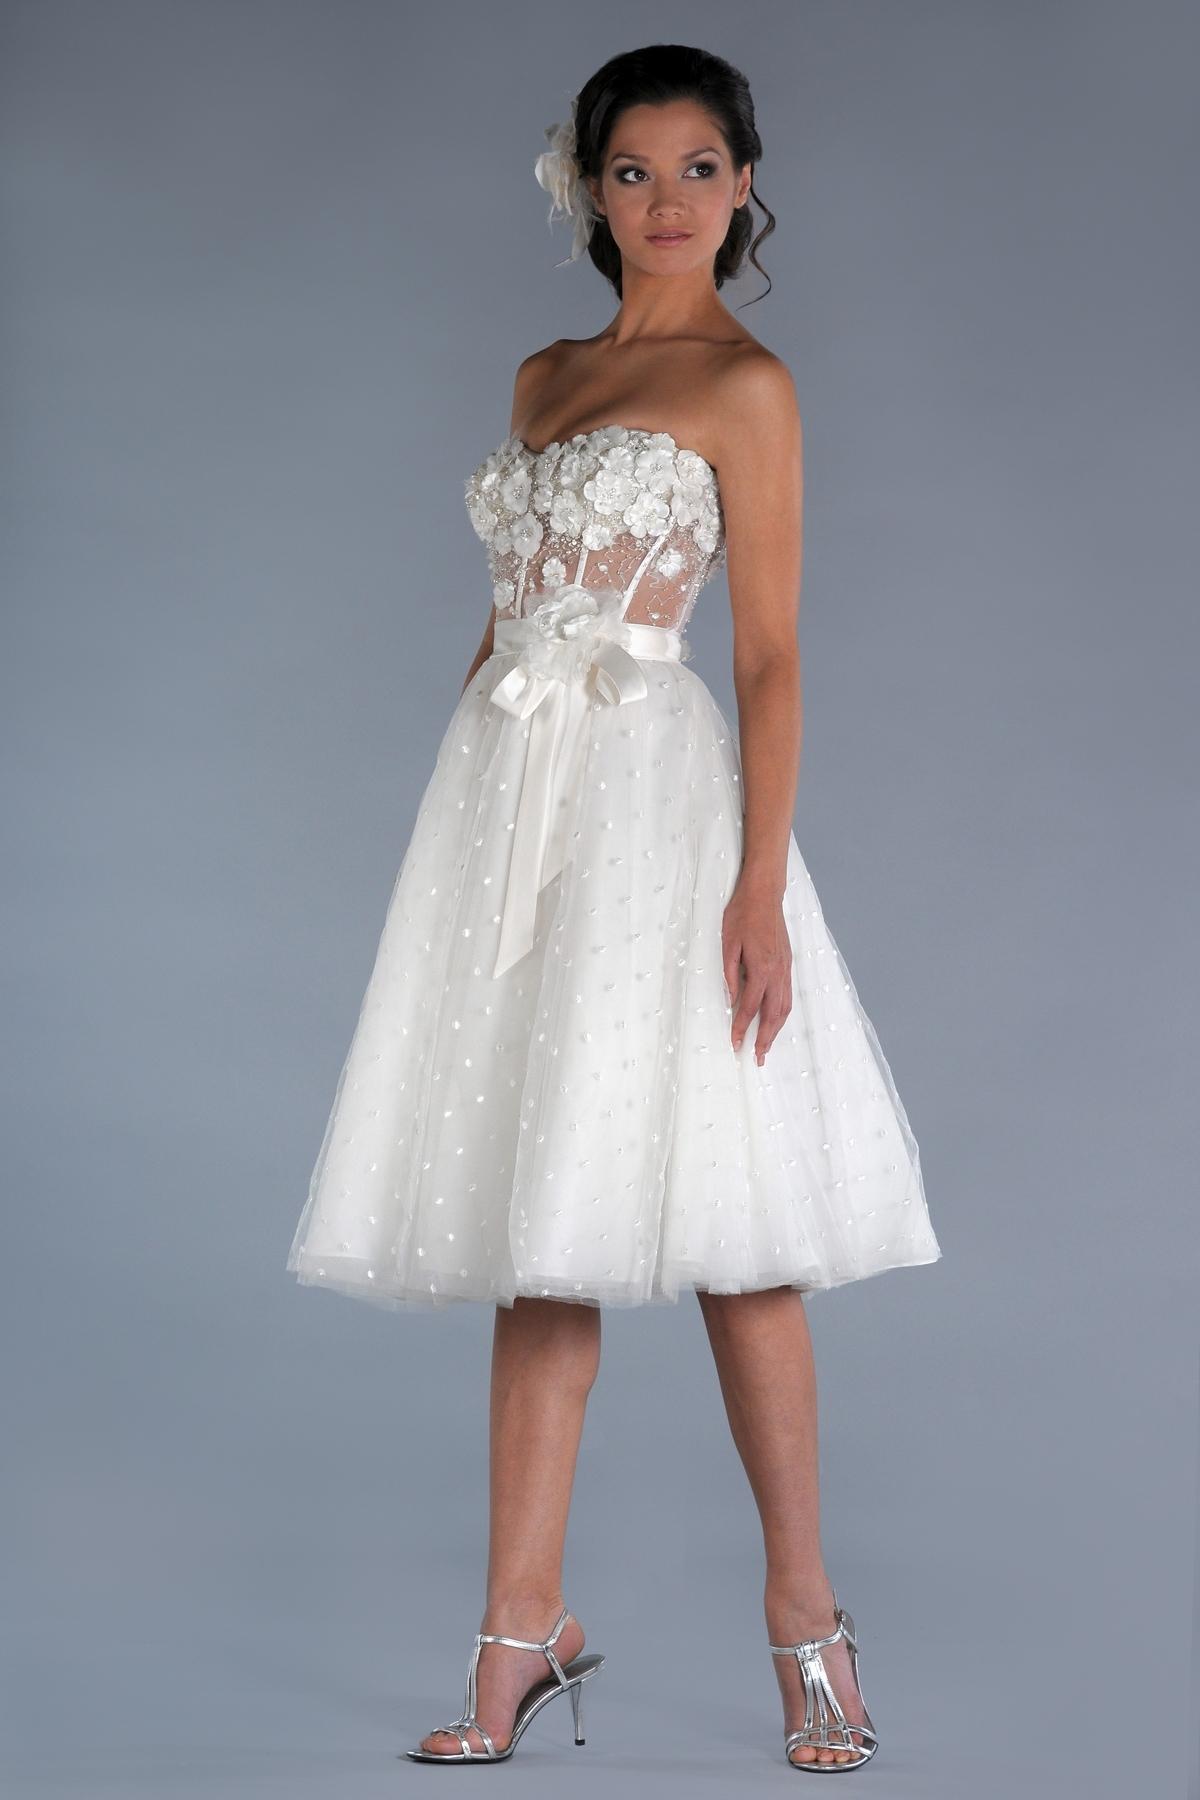 best online wedding dress sites uk wedding dresses websites Best Online Wedding Dress Sites Review Dresses